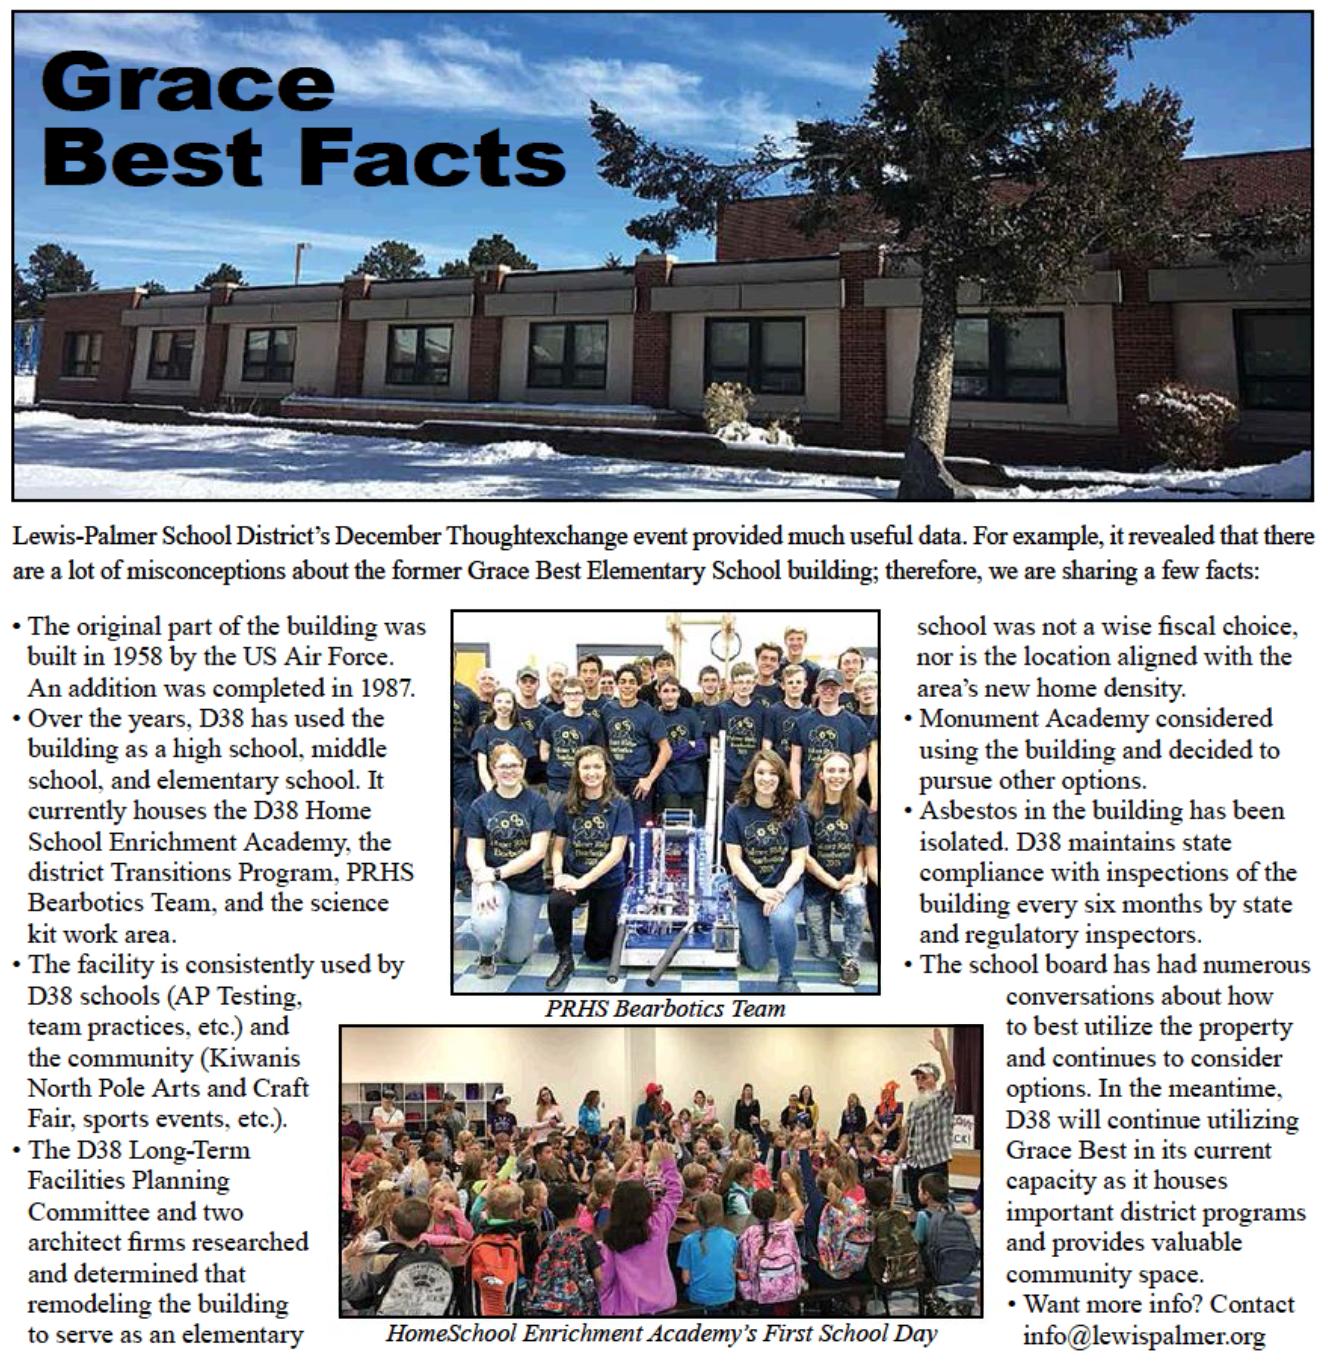 GraceBestFacts_Tribune_1-30-19.png